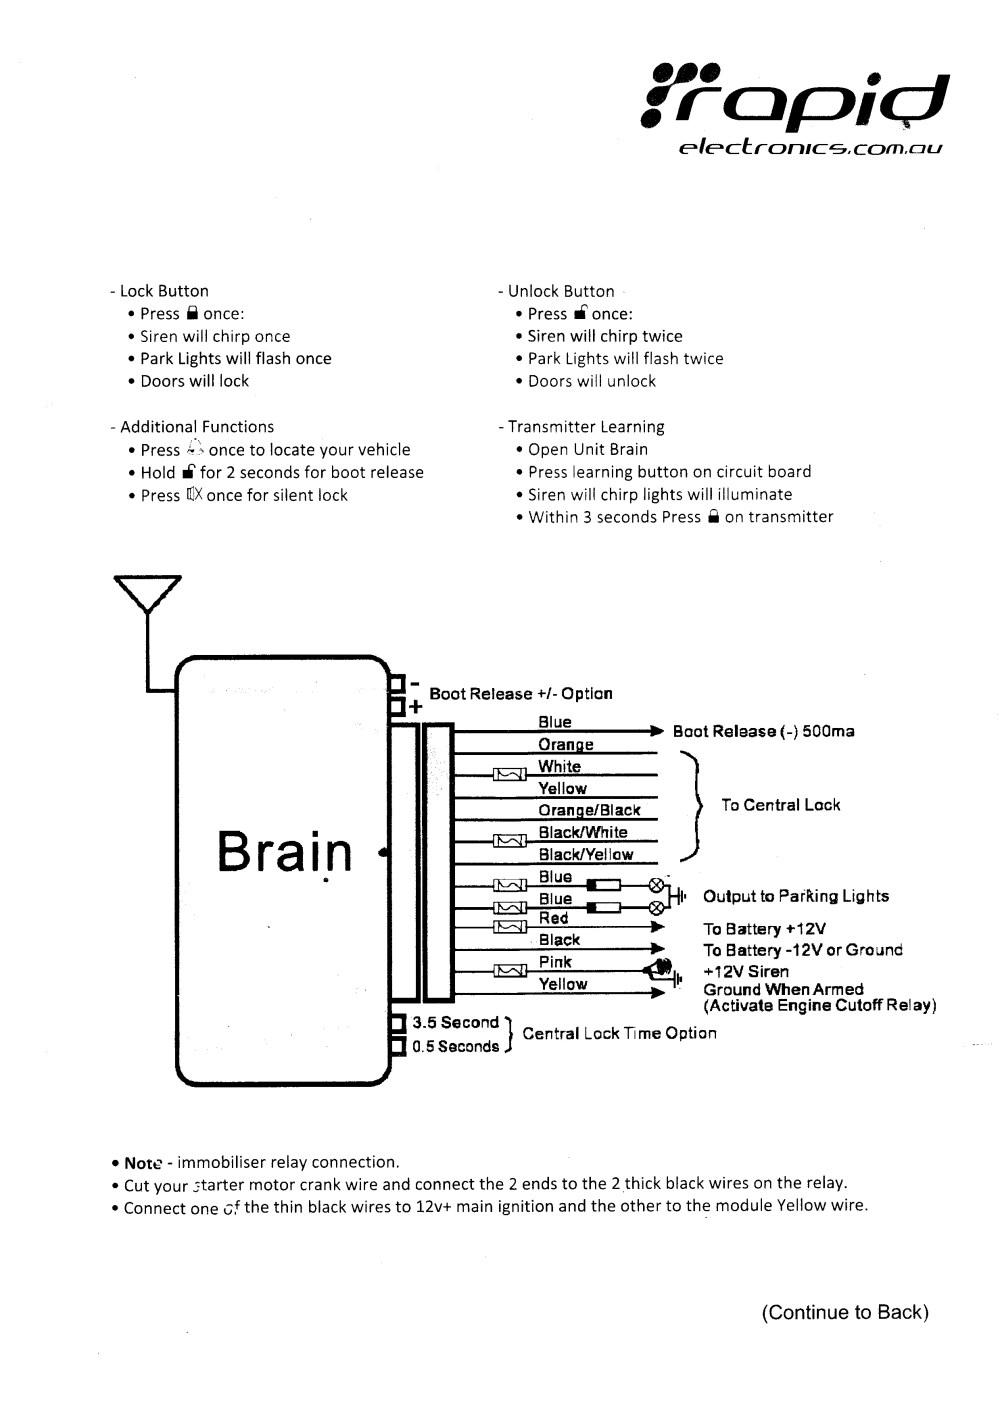 medium resolution of original paper schematic page 1 of 2 jpg